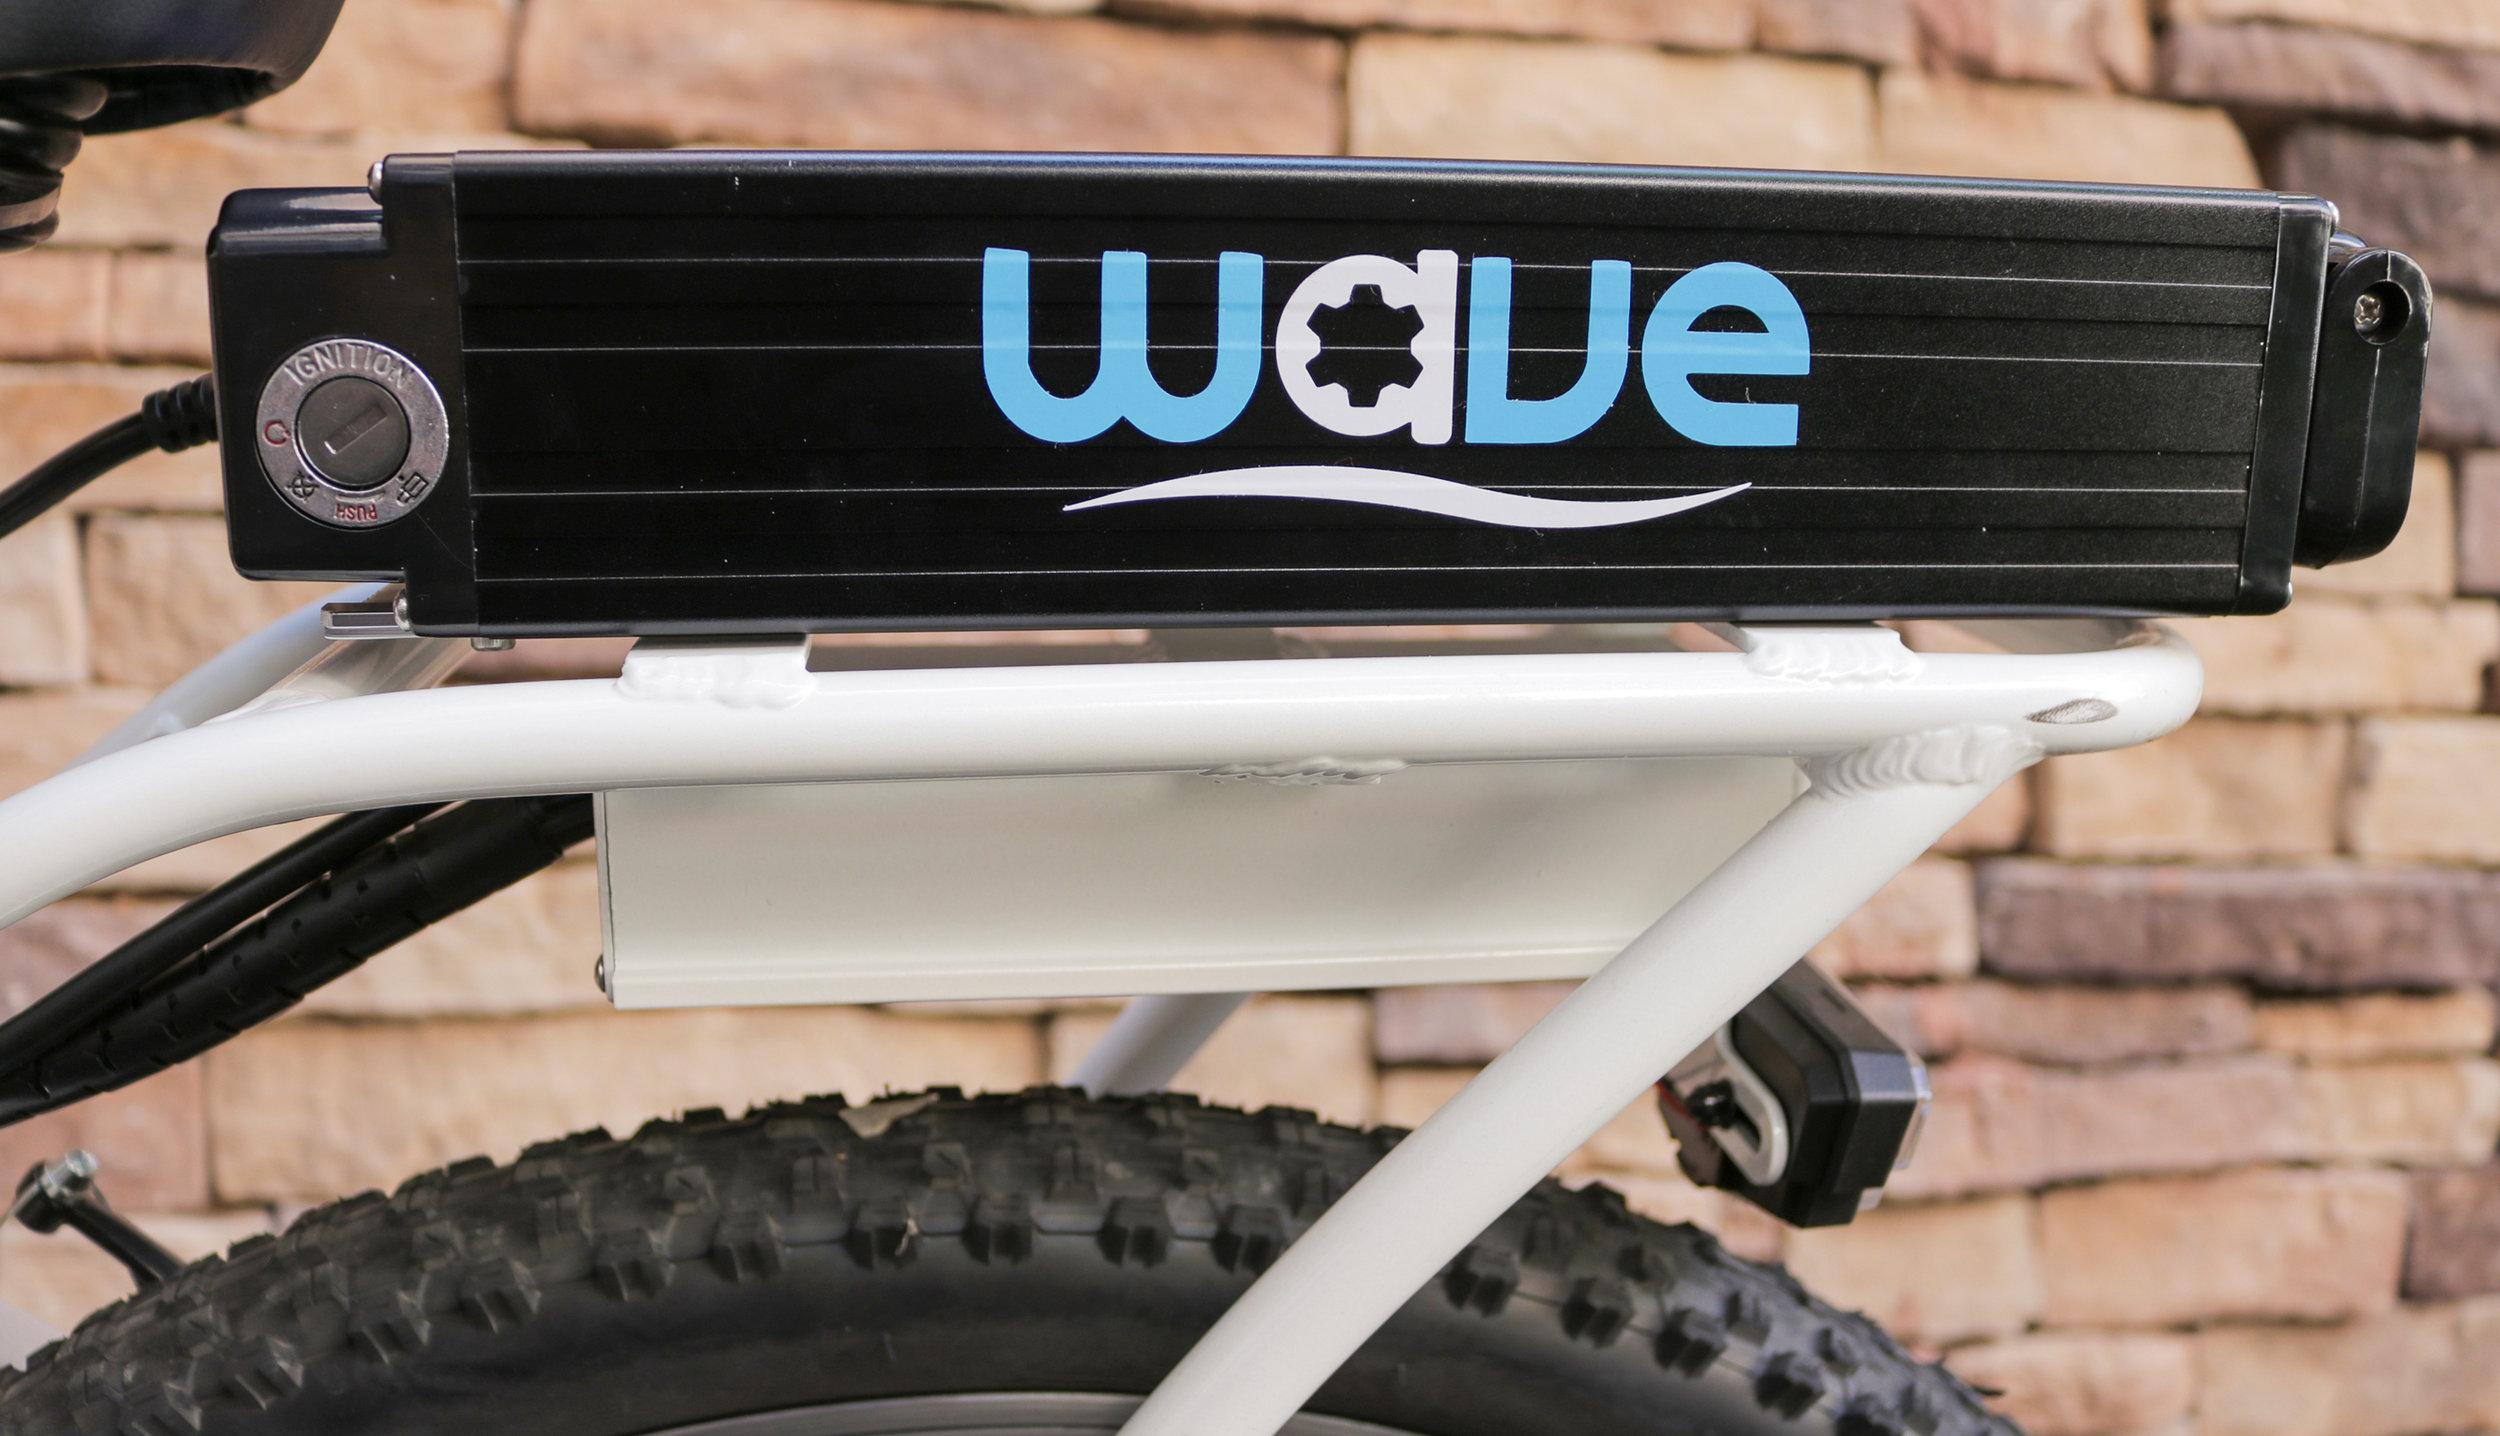 electrified-reviews-wave-electric-bike-review-battery-profile-rear-rack.jpg